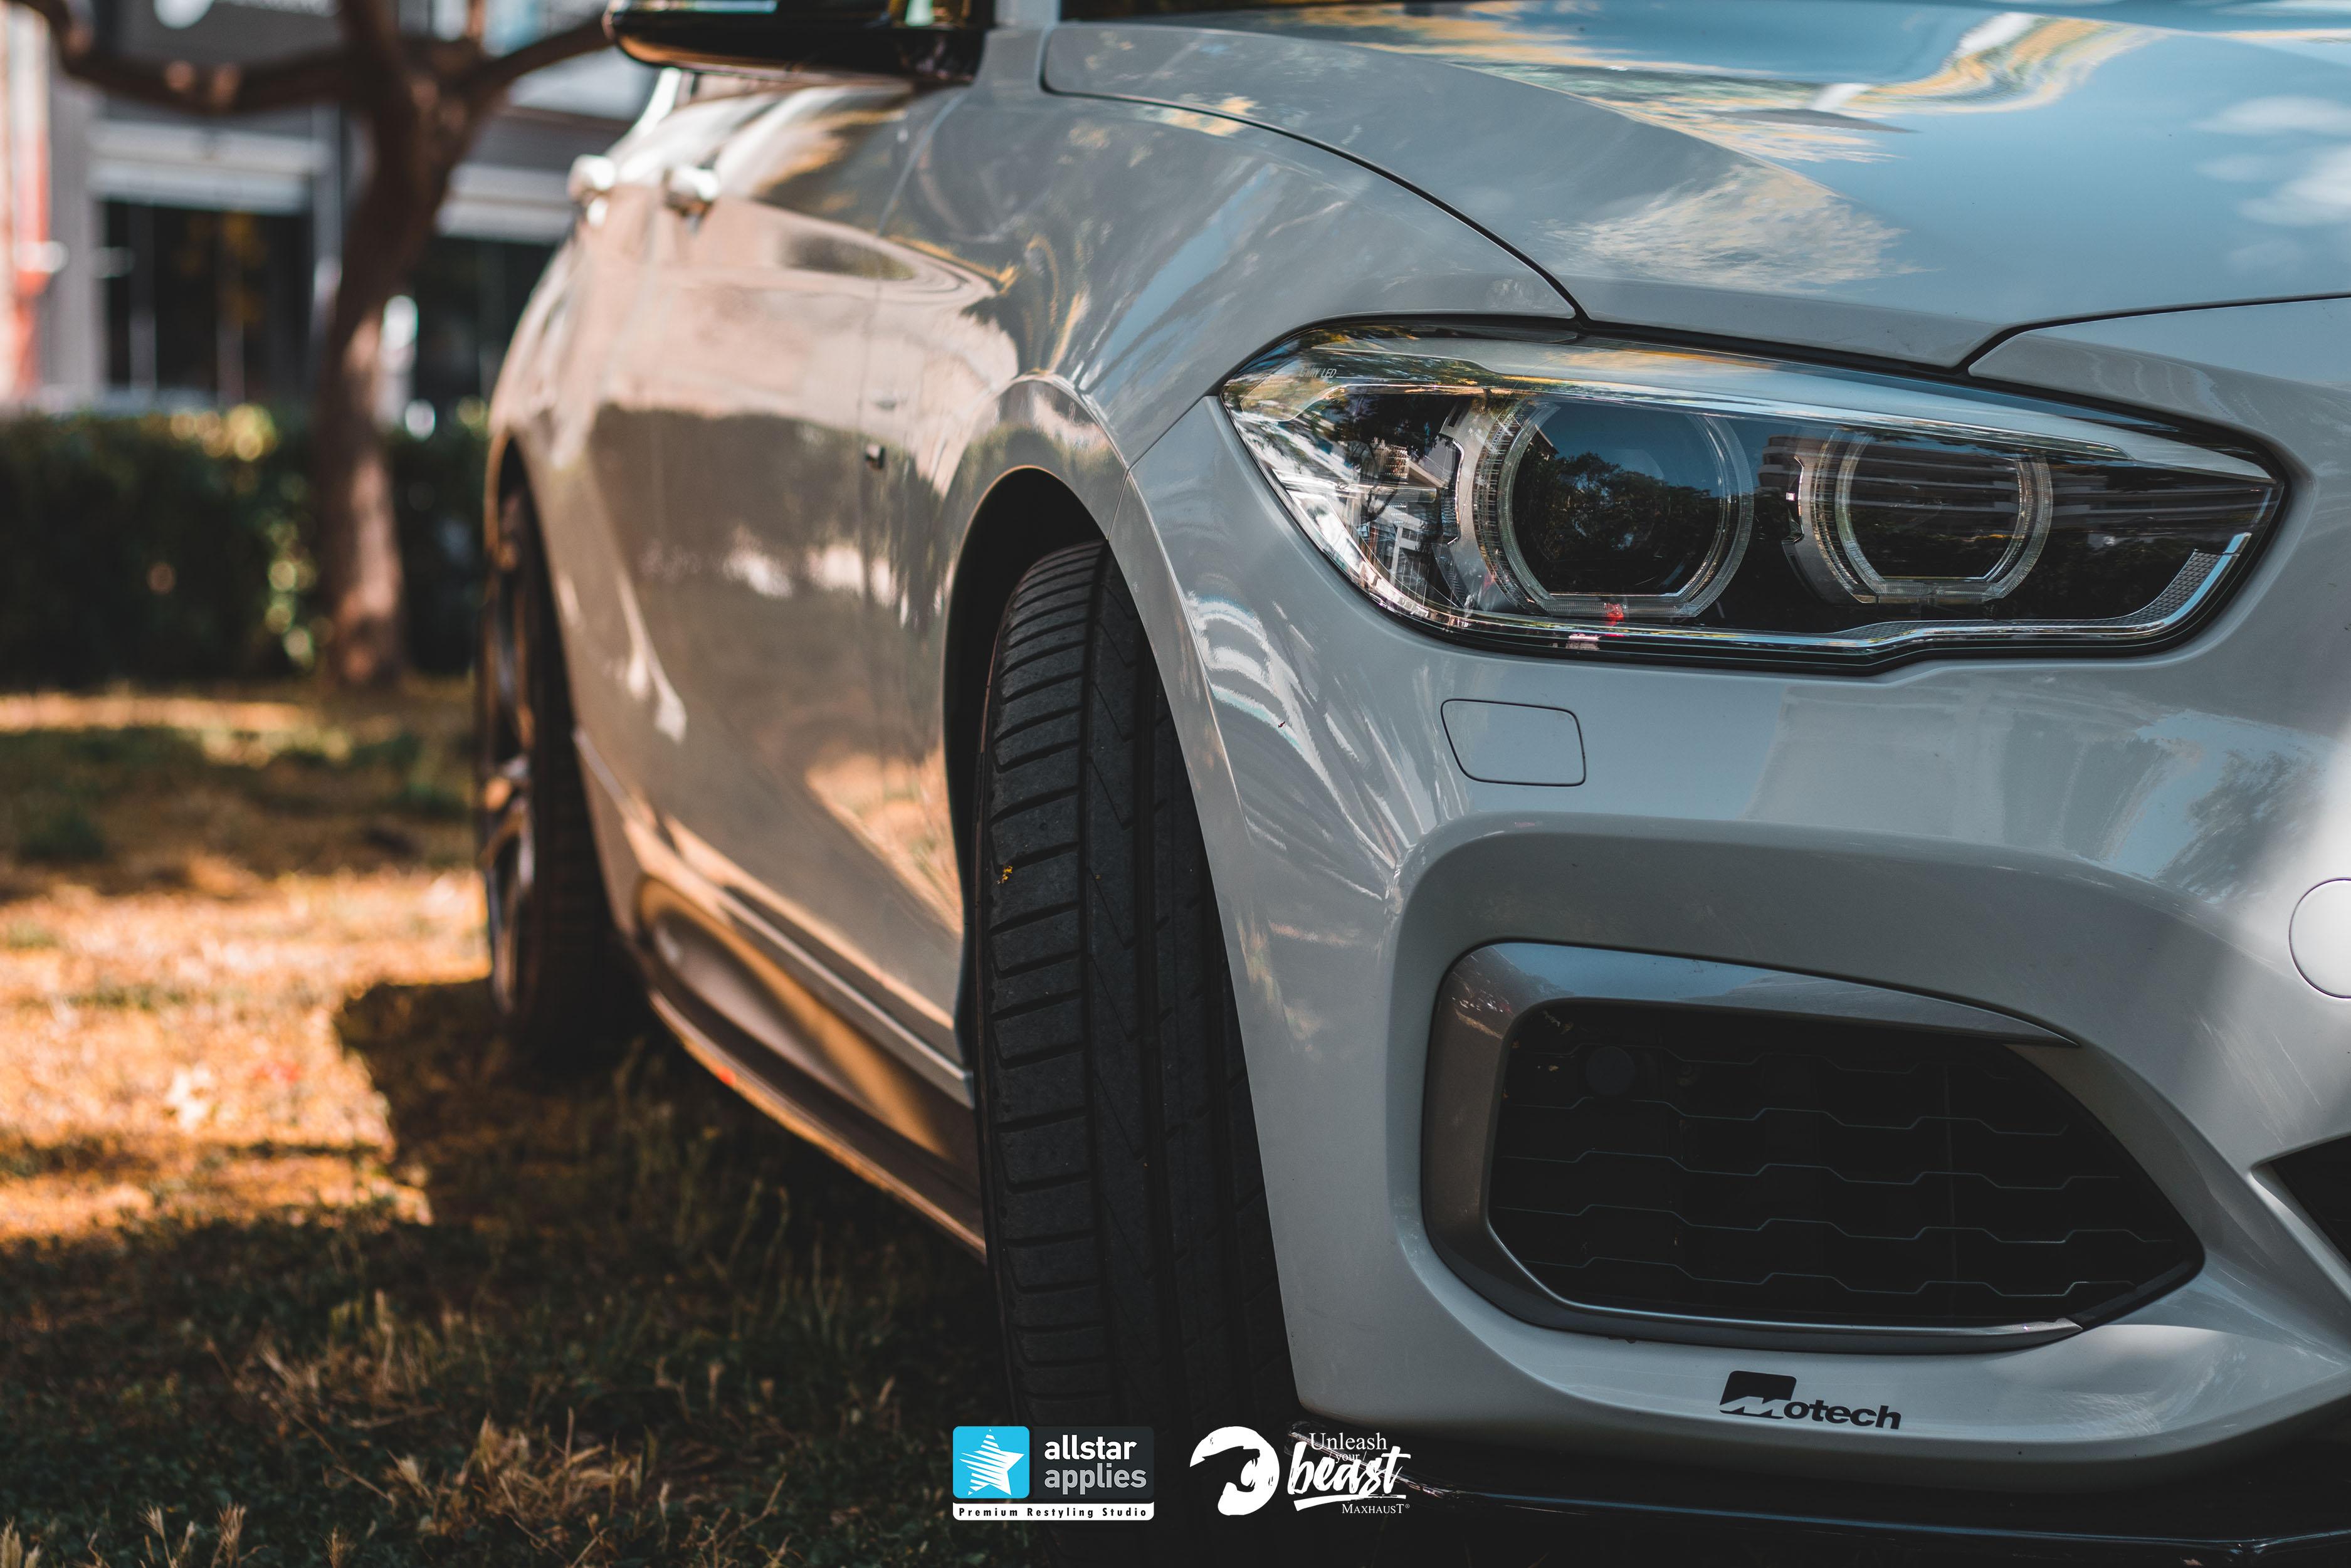 BMW SERIES 1 M PACKET MAXHAUST 6